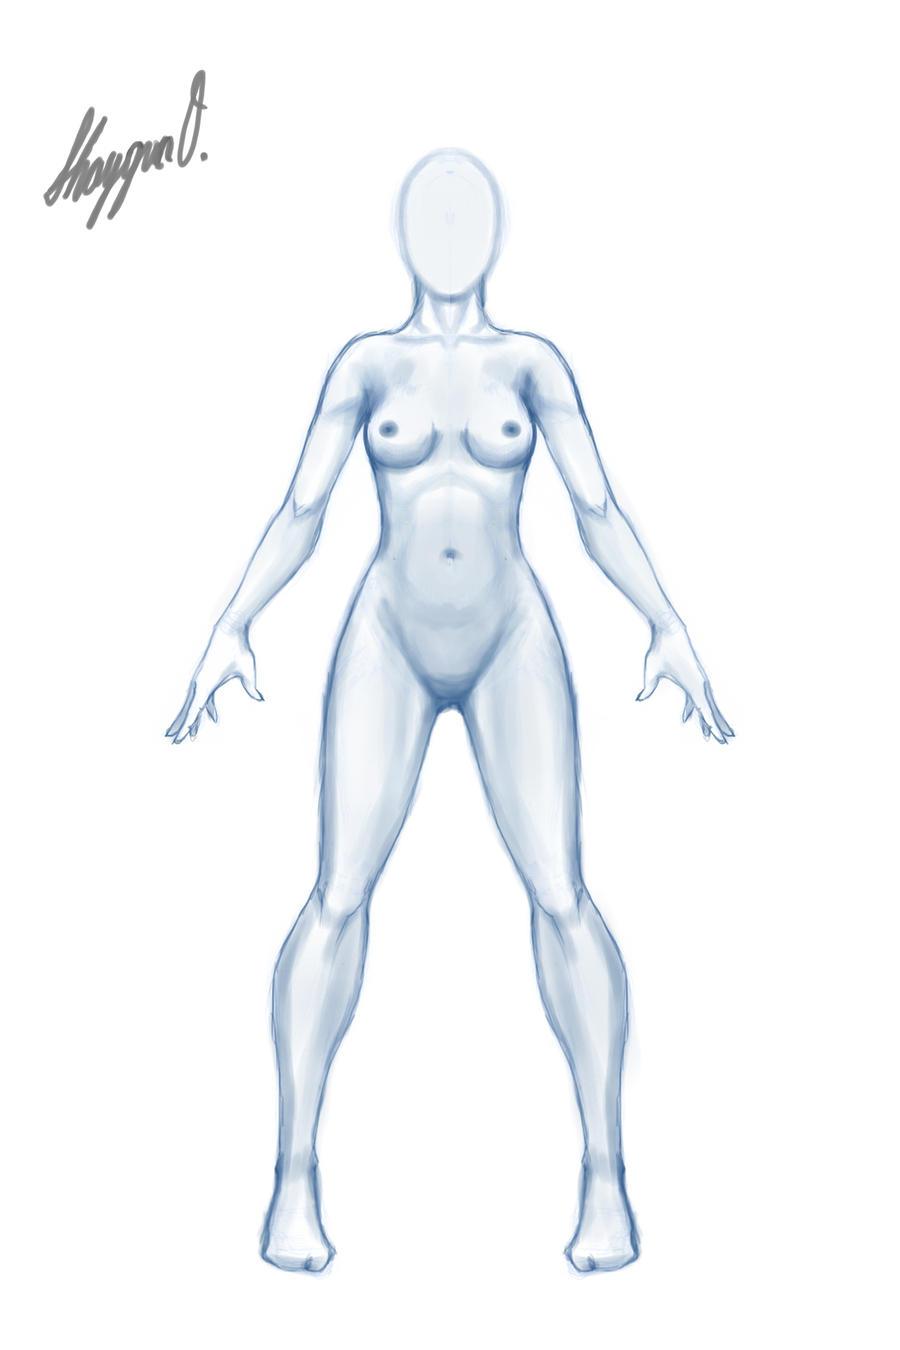 Anatomy favourites by NimDC on DeviantArt